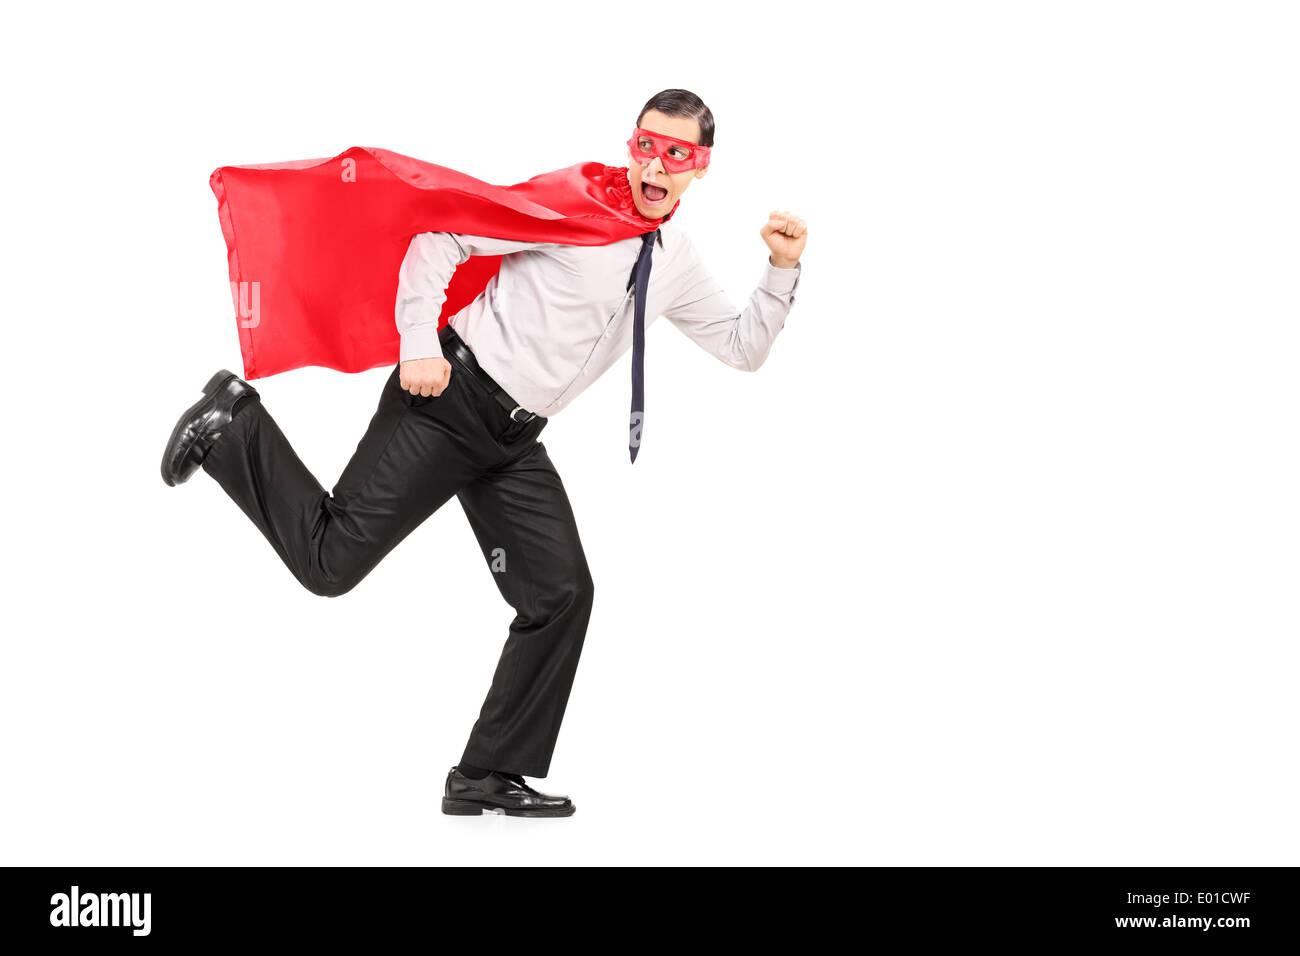 Scared man in superhero costume running away from something Stock Photo